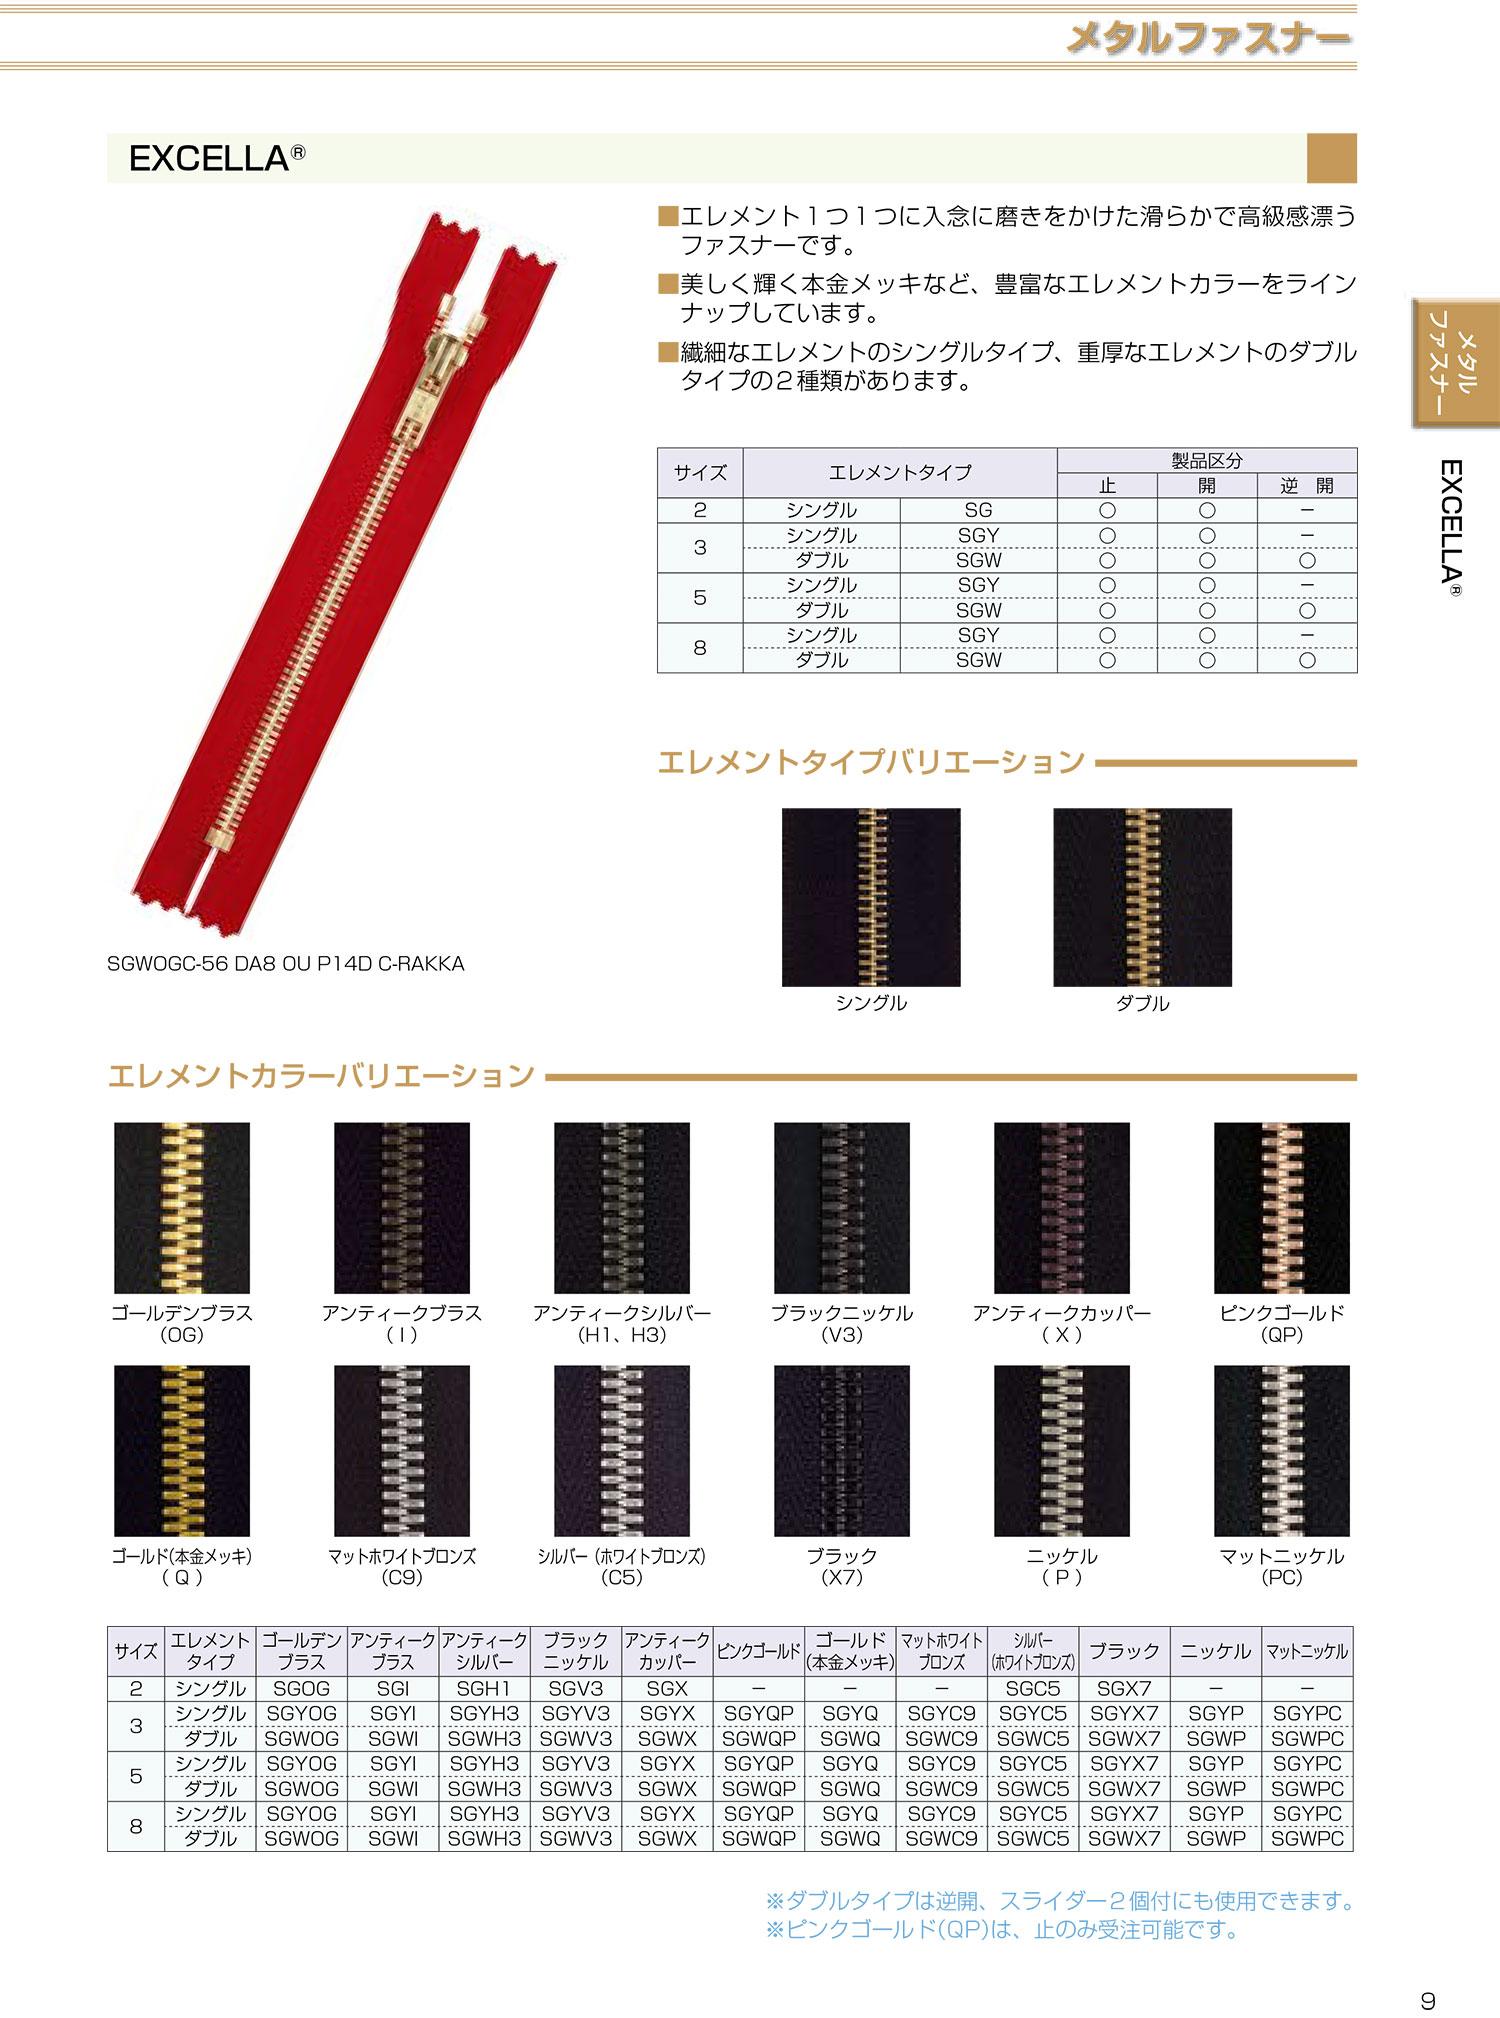 5SGYV3OR エクセラ 5サイズ ブラックニッケル オープン シングル[ファスナー] YKK/オークラ商事 - ApparelX アパレル資材卸通販